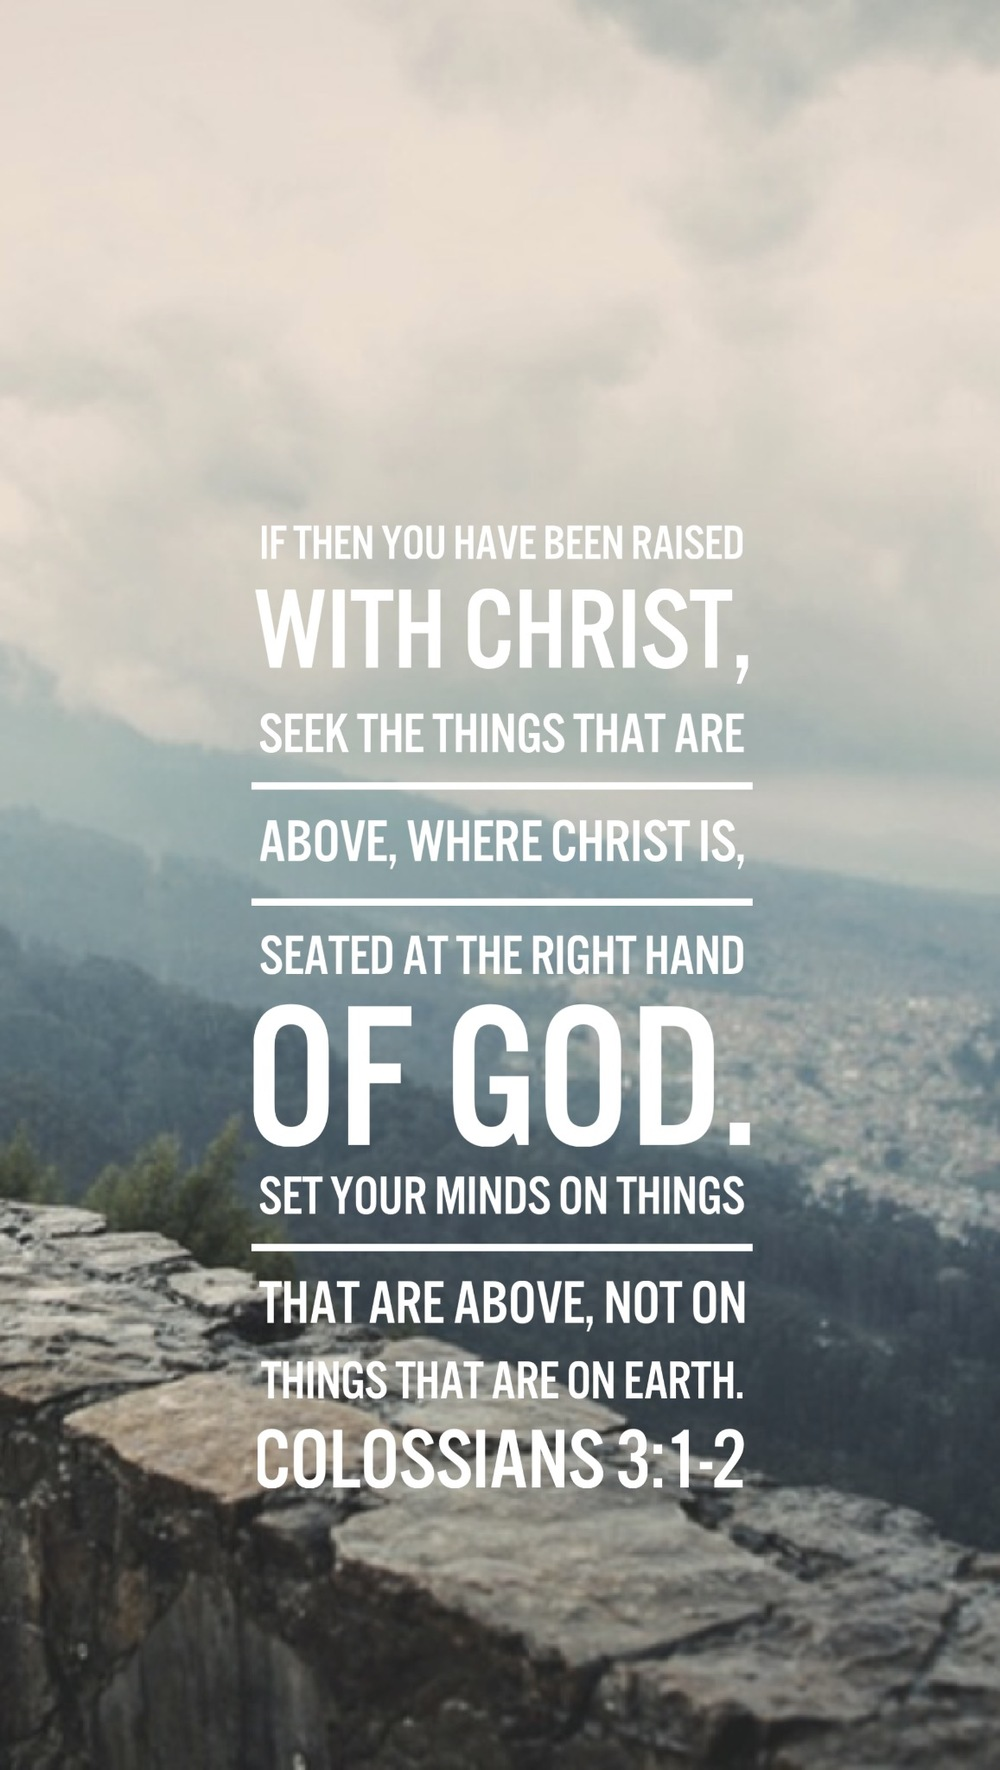 Colossians 3.1-2.JPG